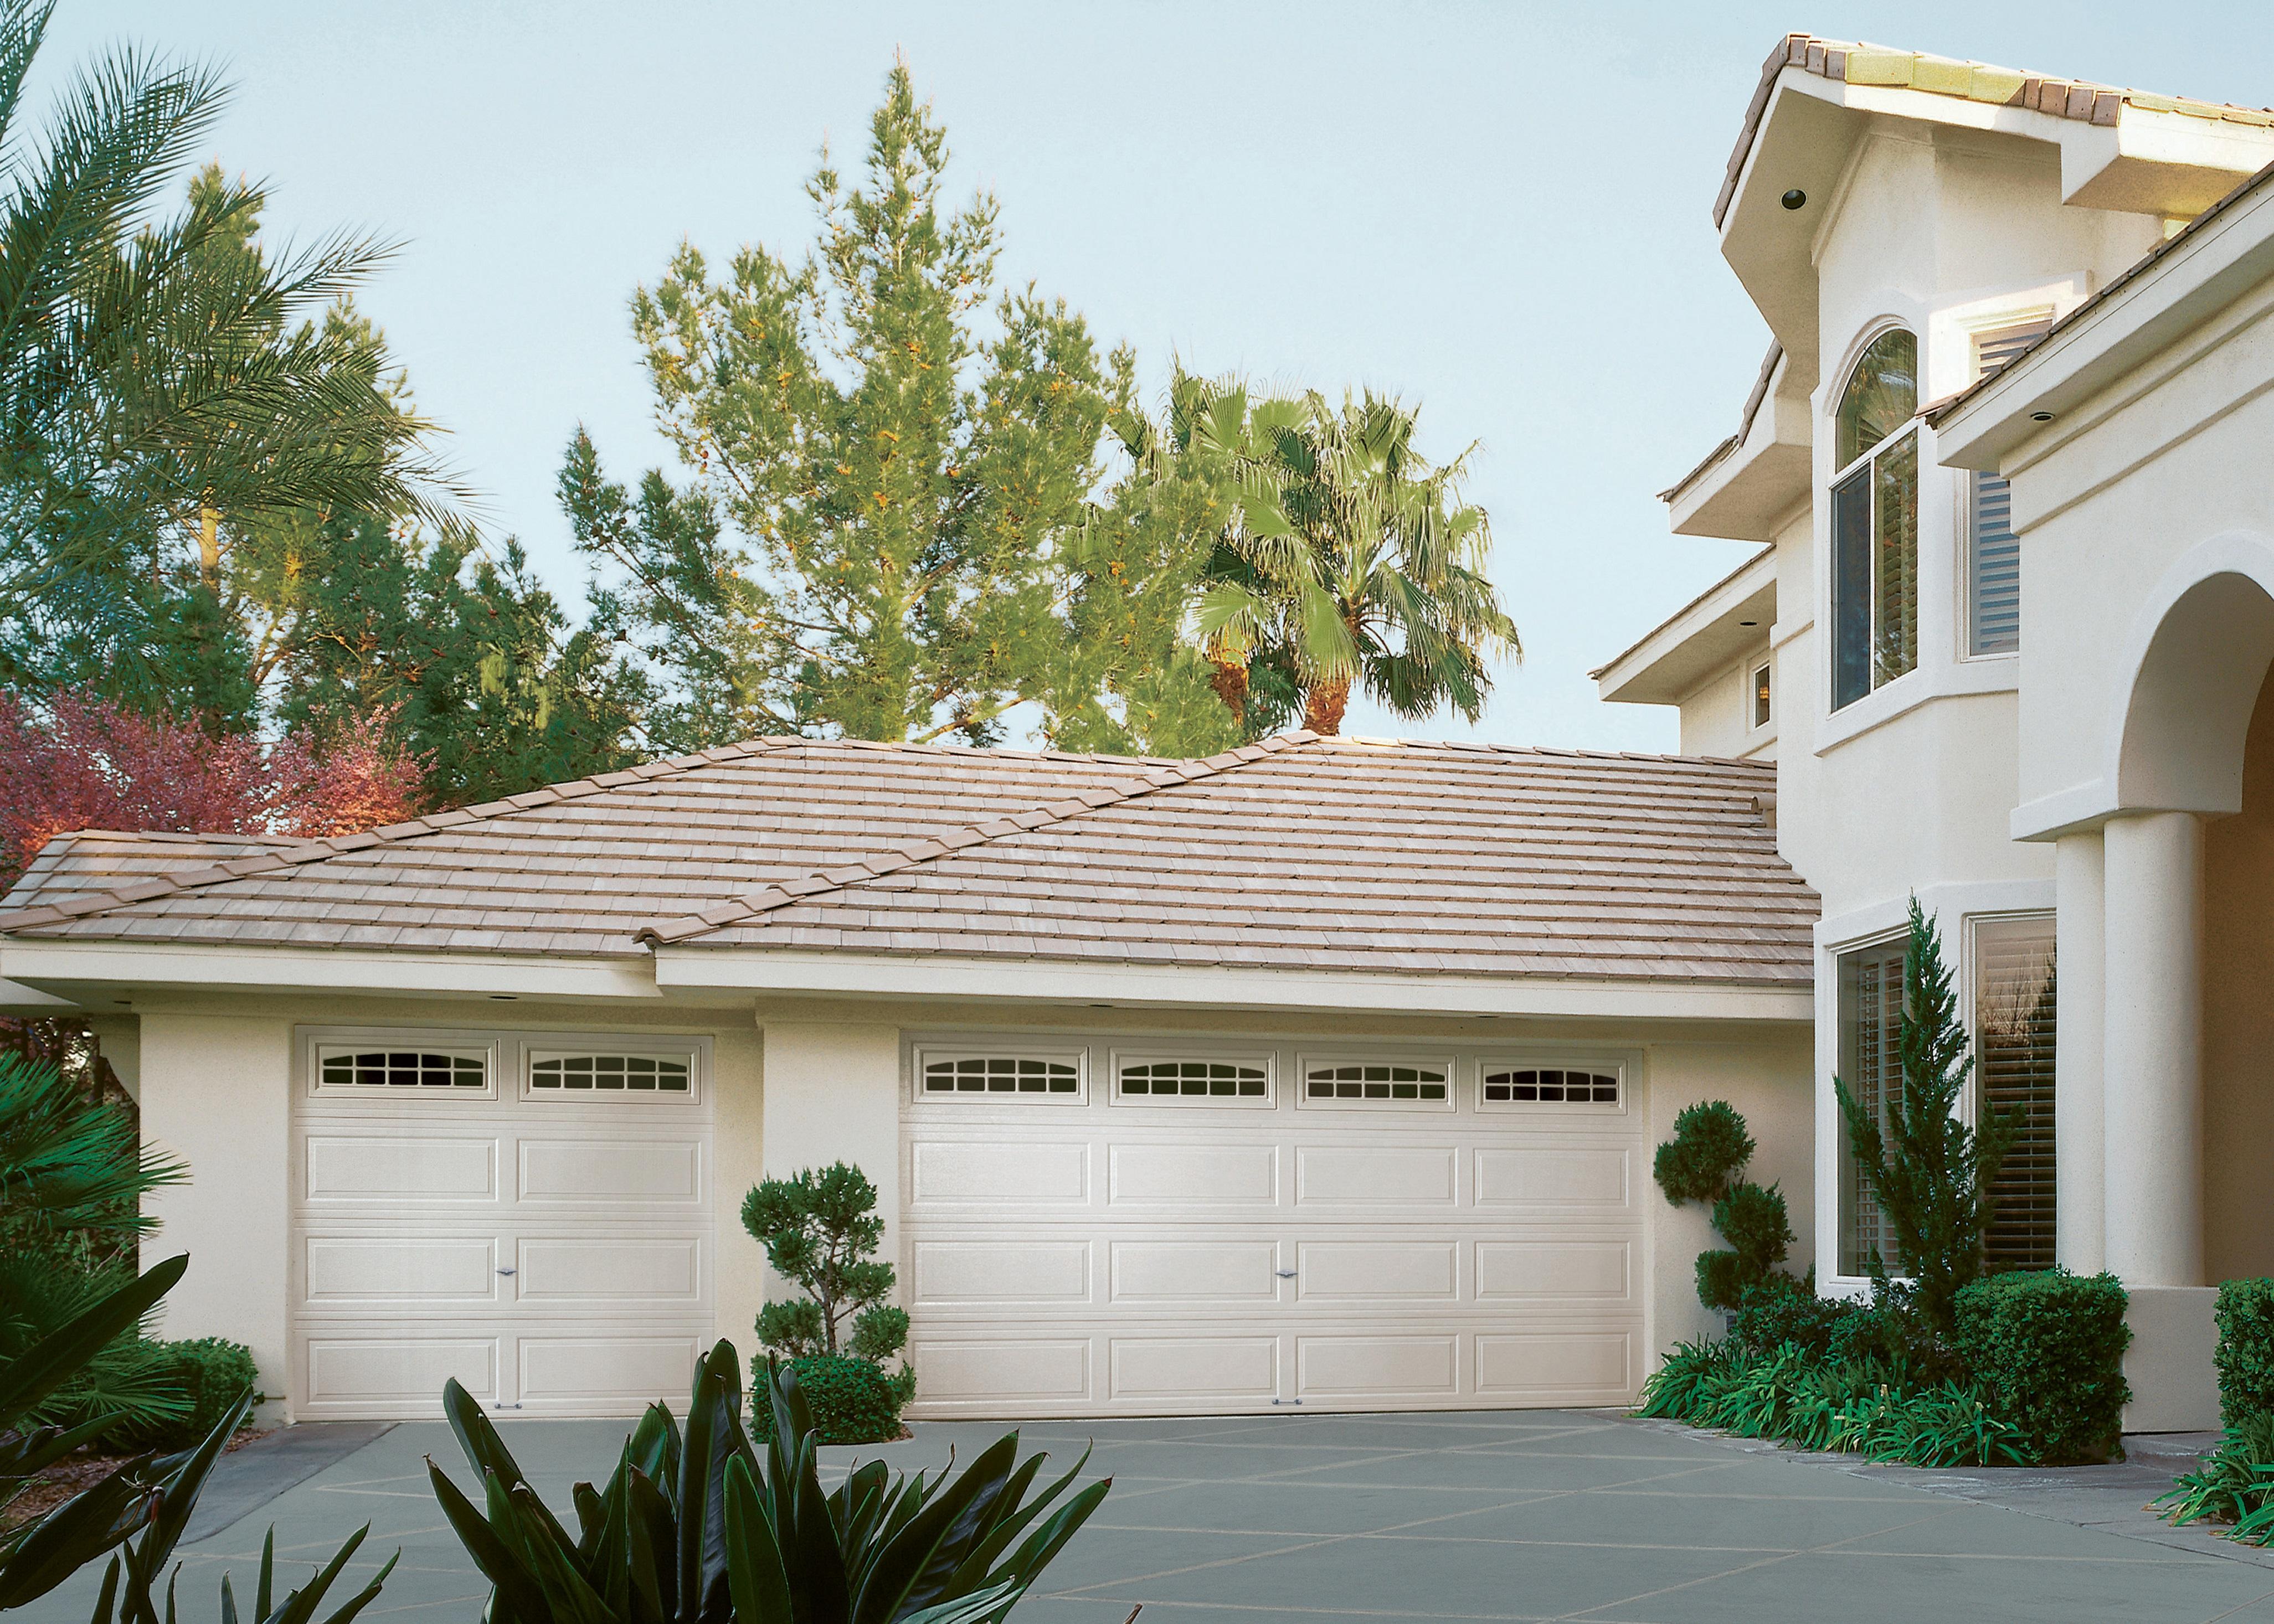 Hanson Overhead Garage Door Service 2777 Yulupa Ave Ste 355, Santa Rosa, CA  95405   YP.com